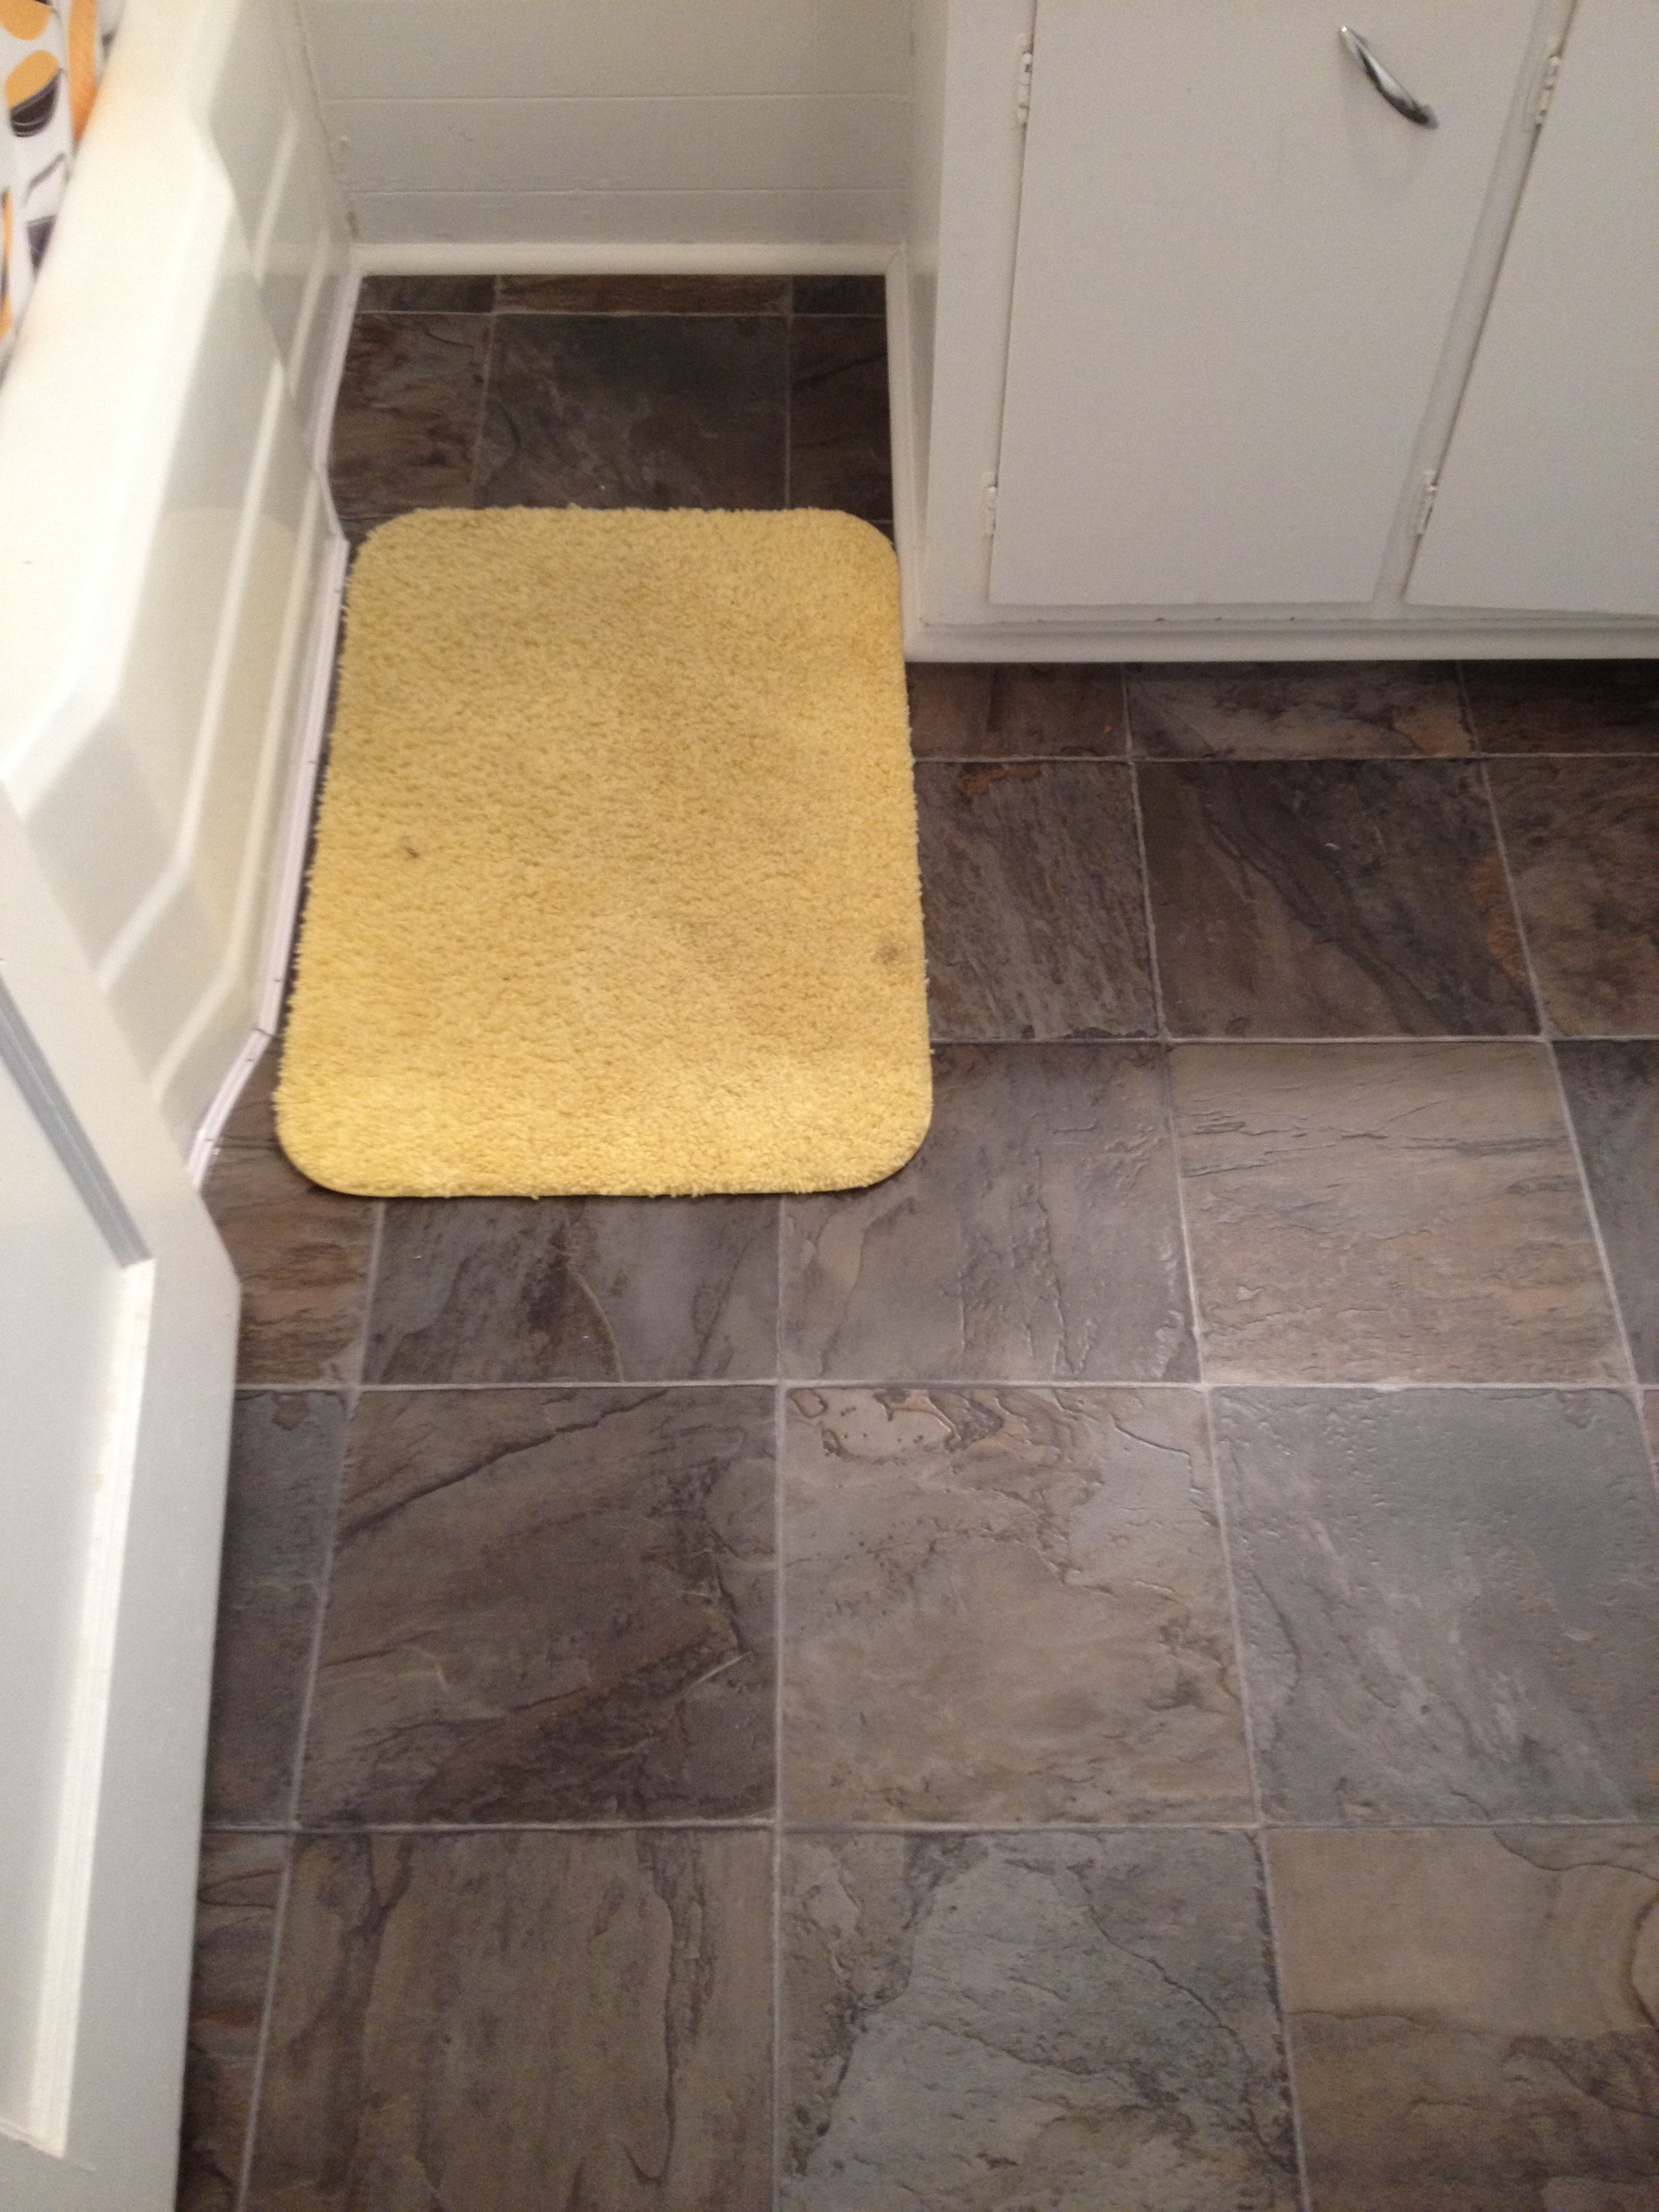 Bathroom subfloor installation -  Toilet Subfloor Repair Glueless Flooring Installation Payne